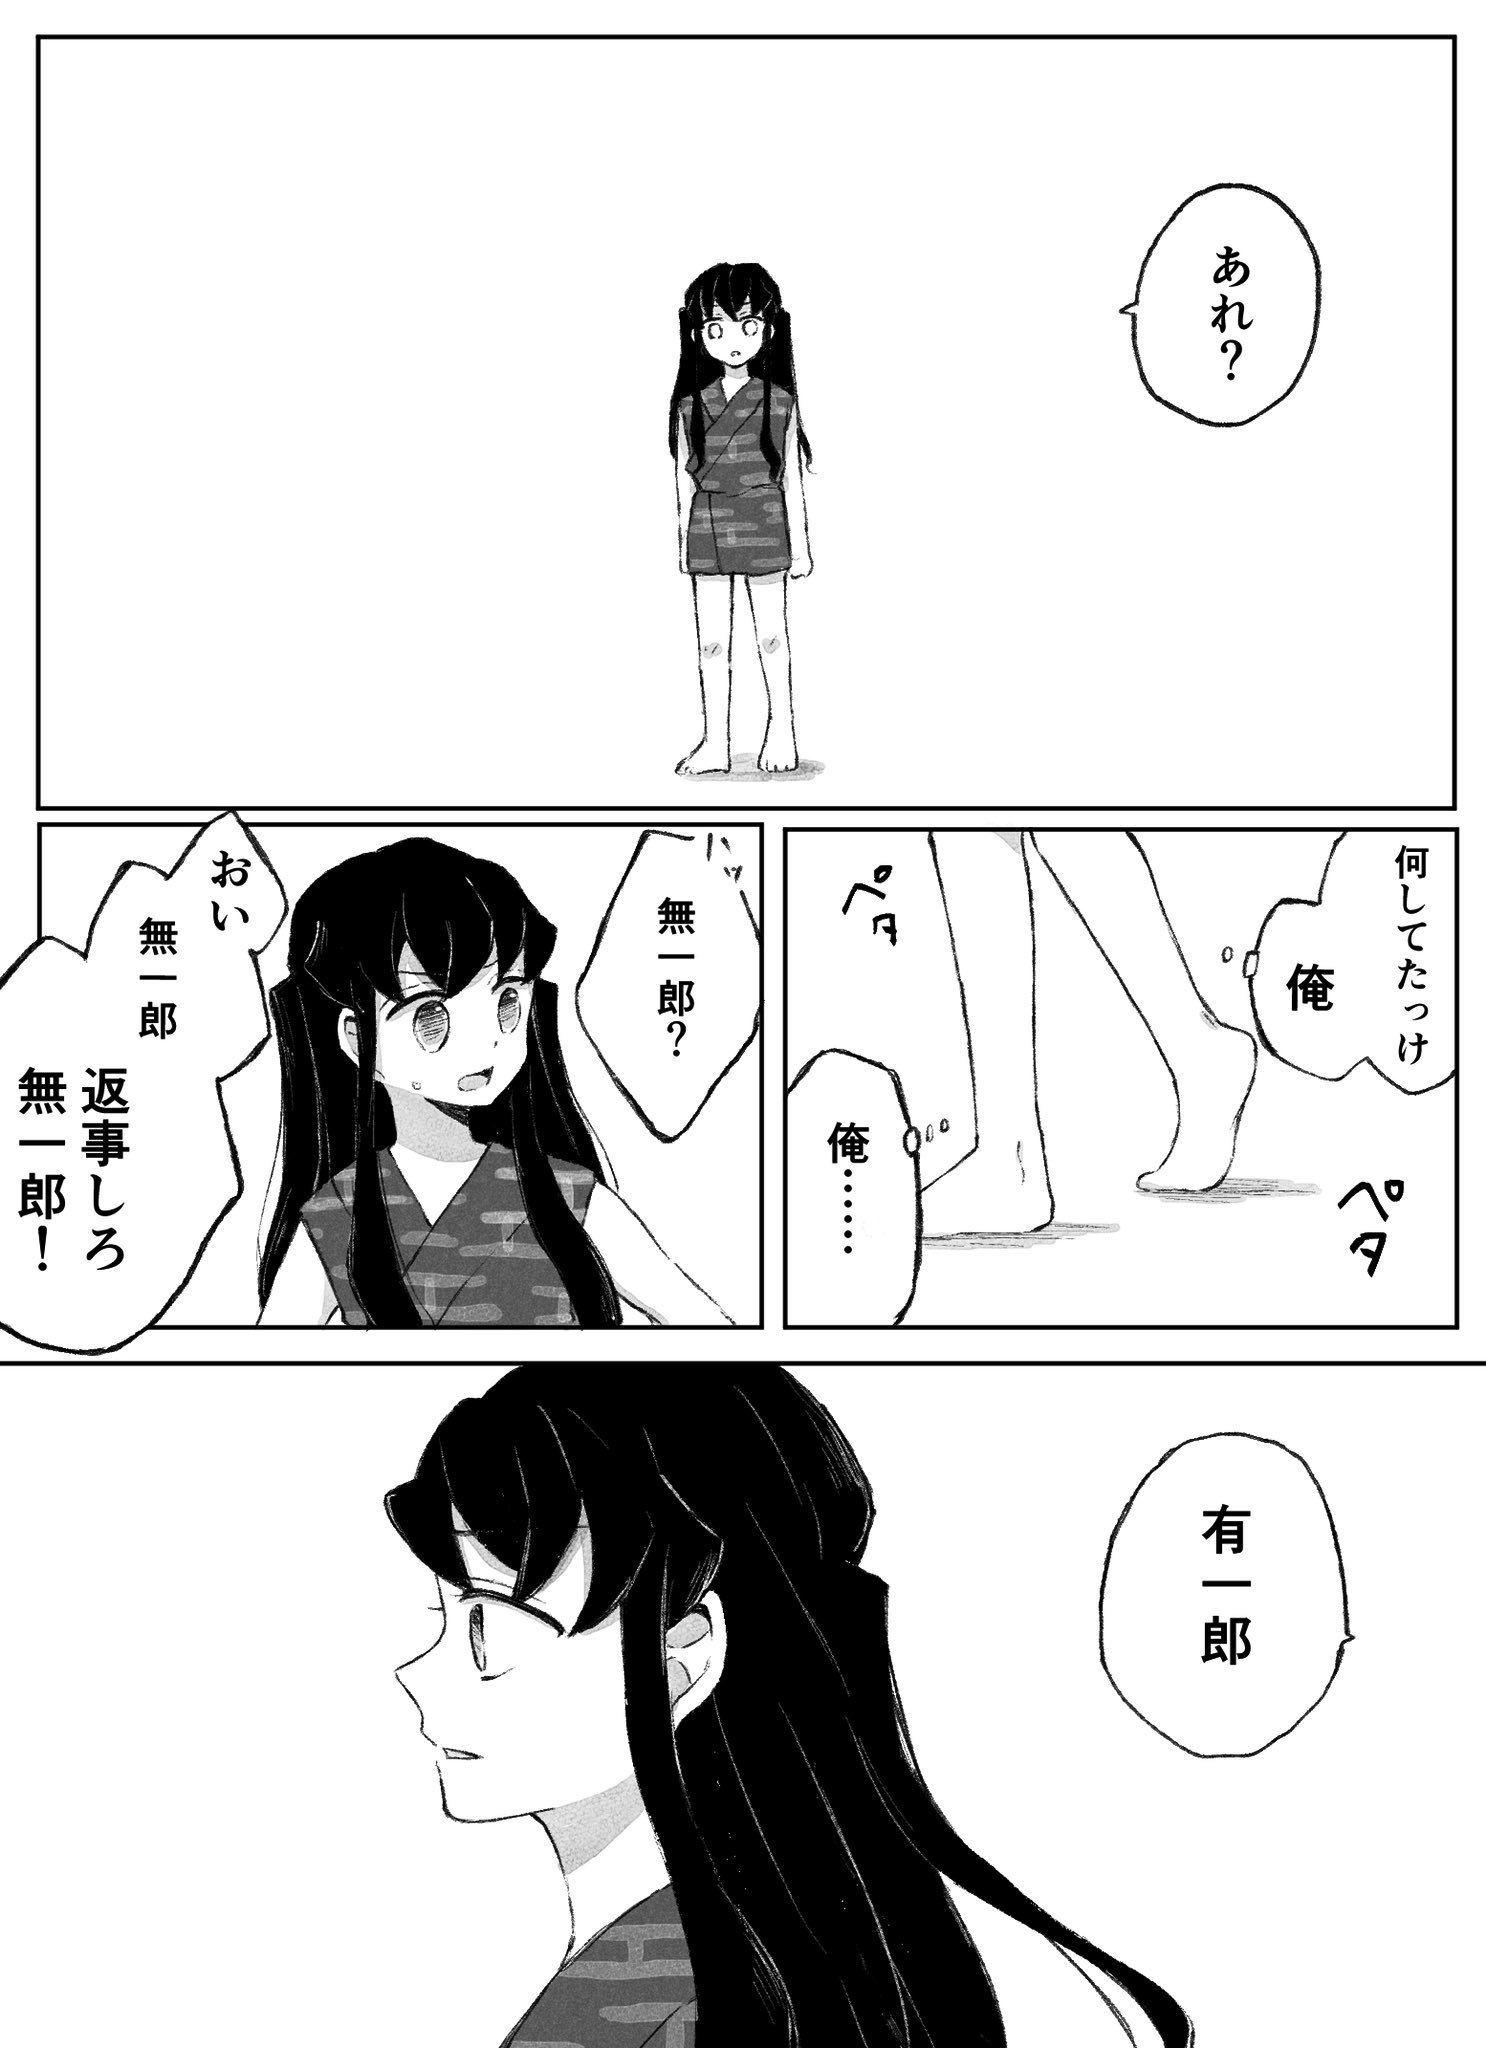 Twitter 漫画, マンガ, 目